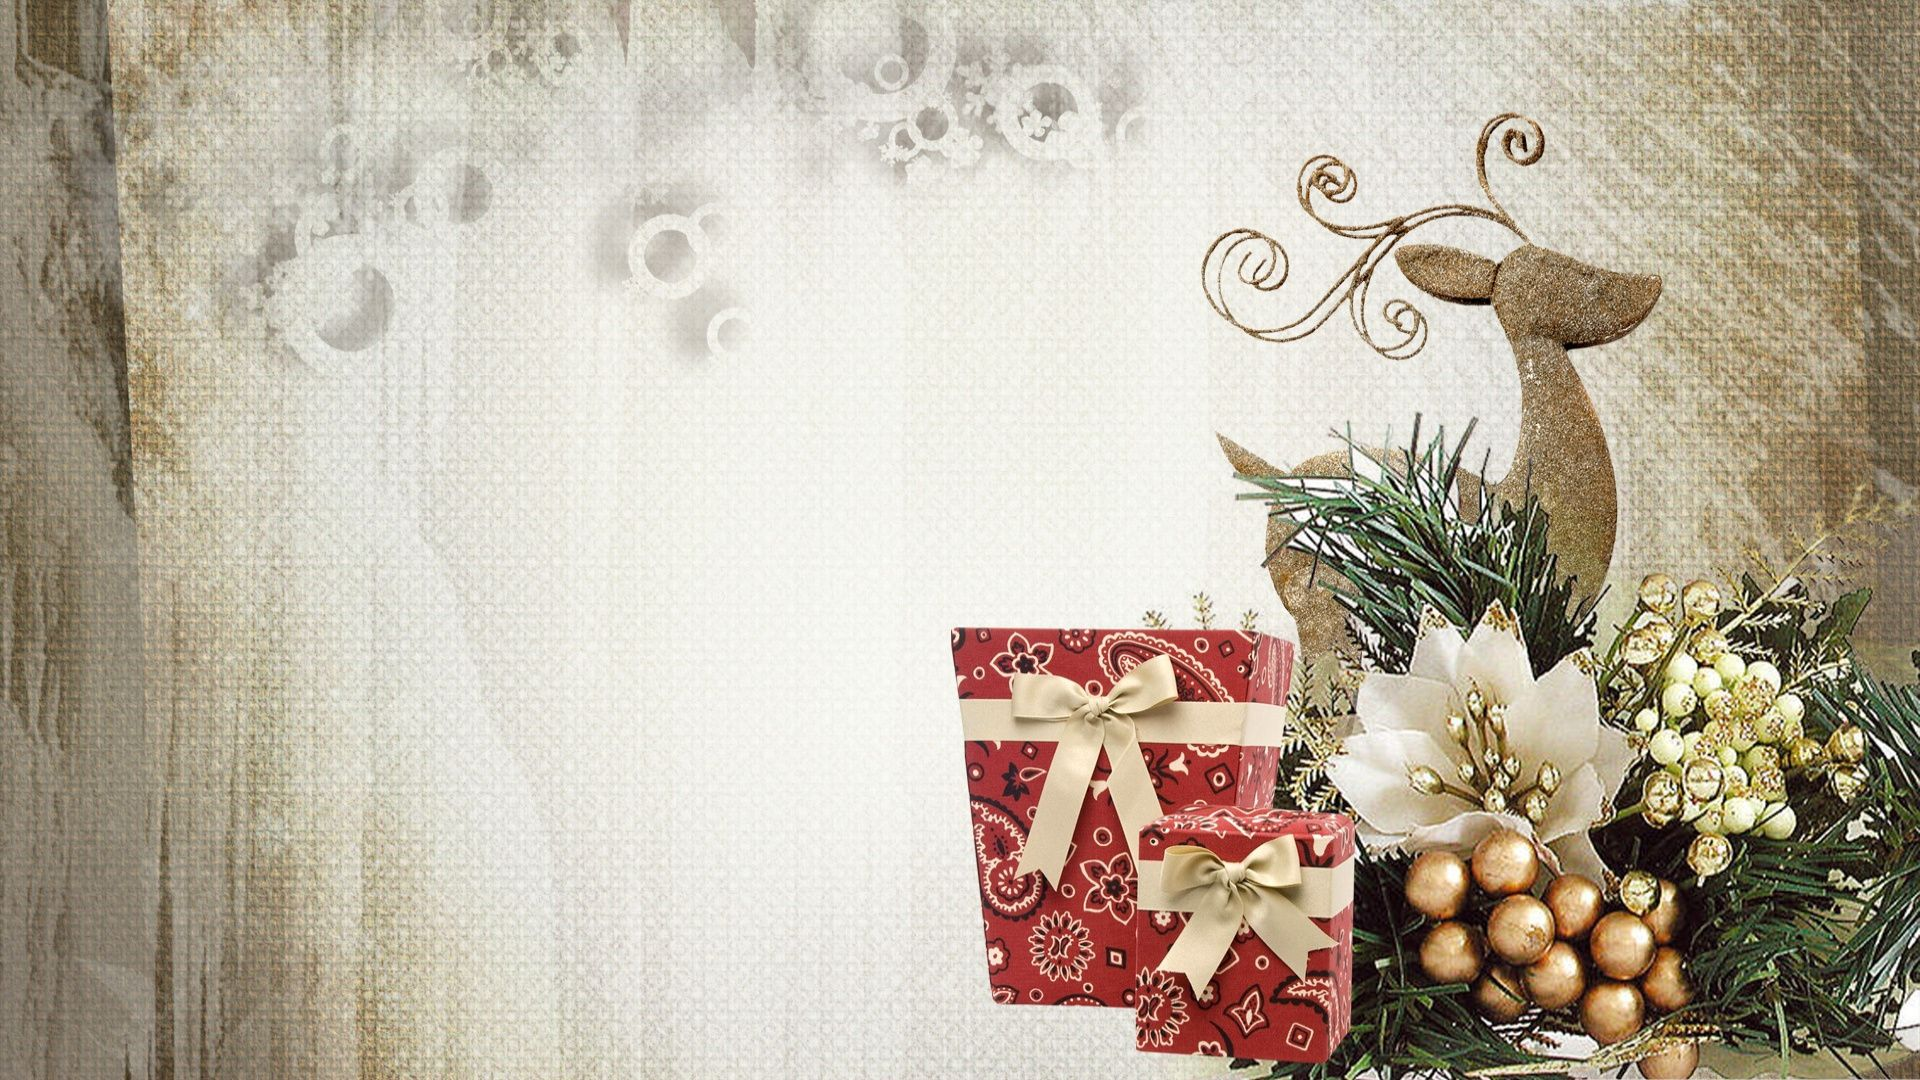 Christmas Scrapbooking Free Wallpaper